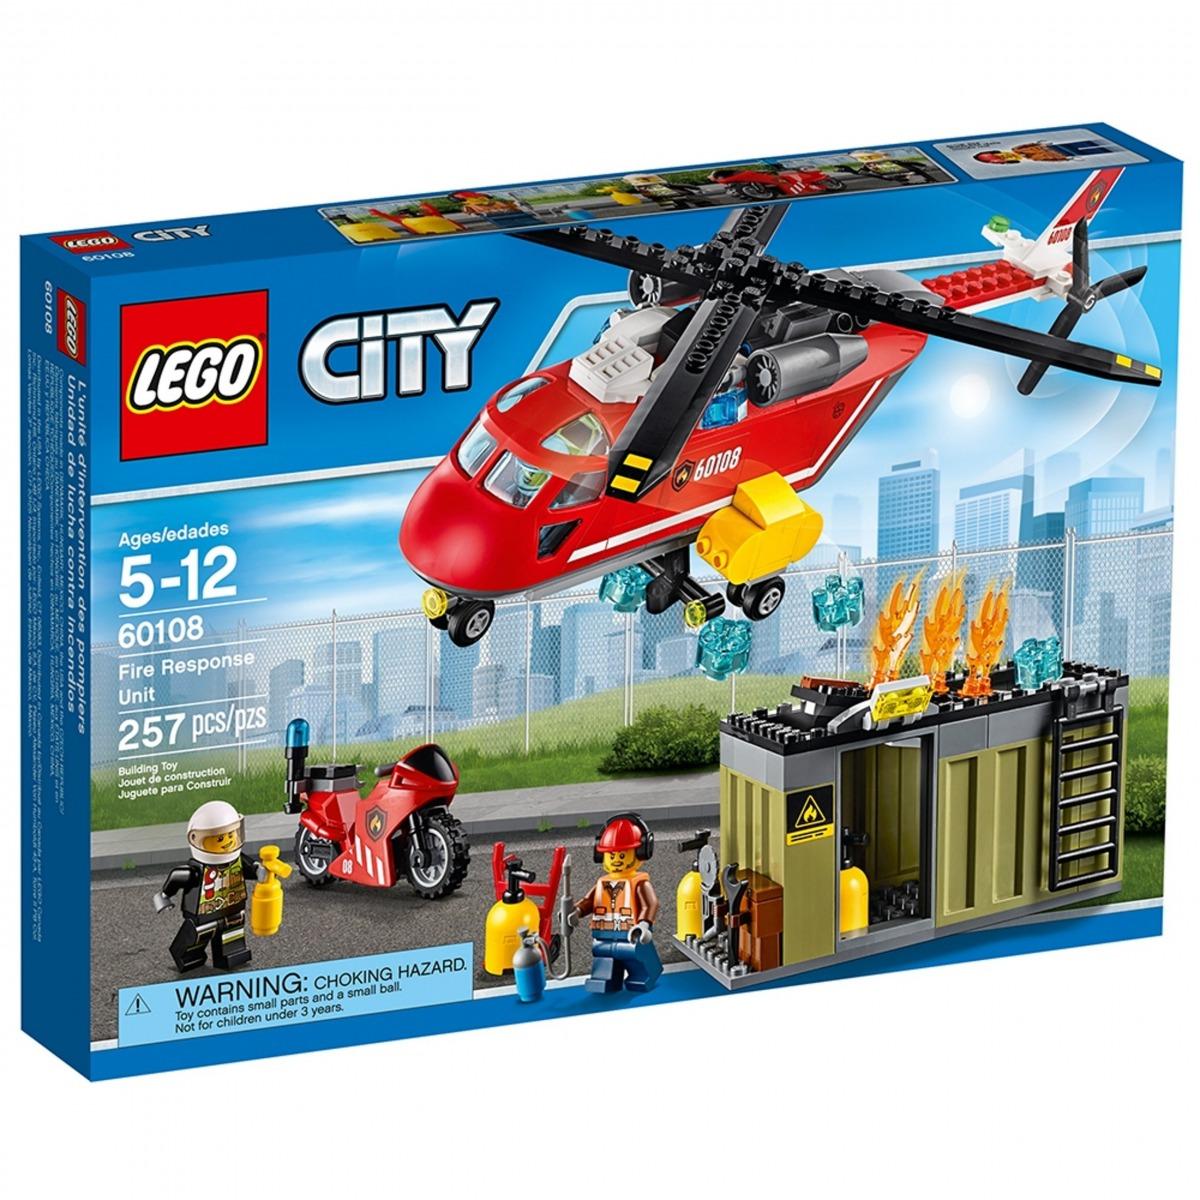 lego 60108 fire response unit scaled